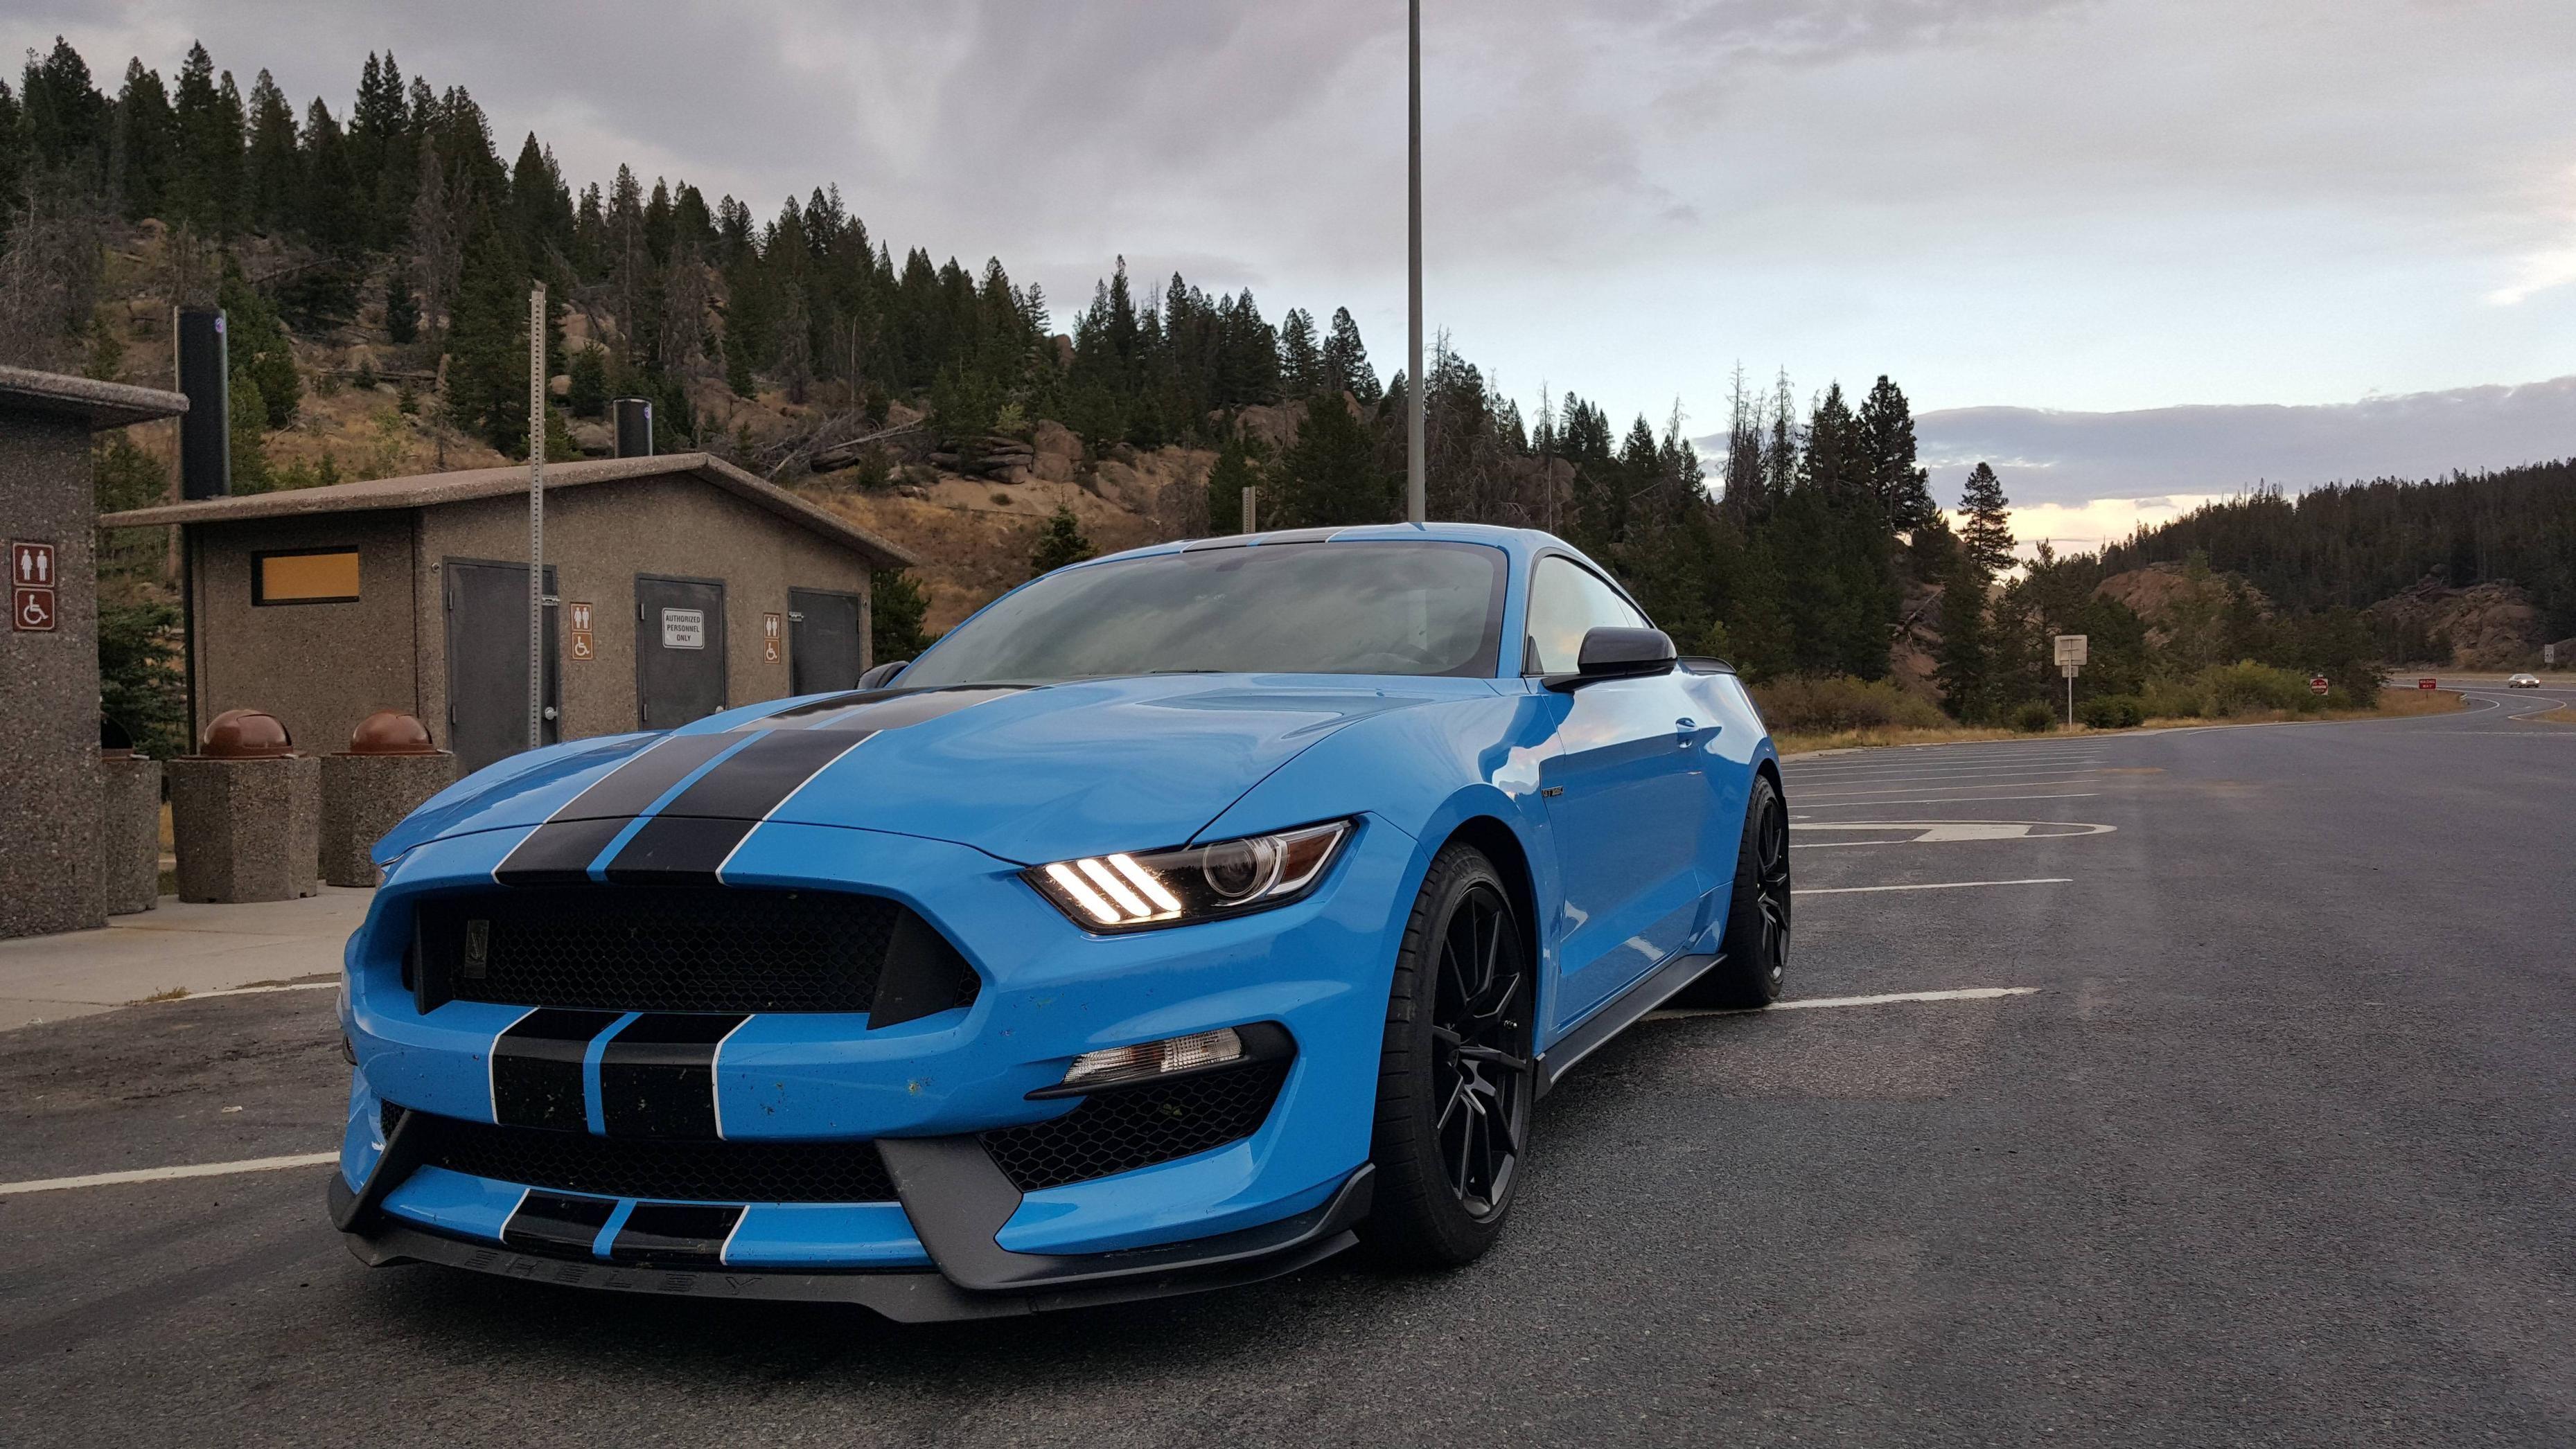 Grabber Blue Mustang >> 2017 Shelby Gt350 Grabber Blue With Black Stripes Cars Ford